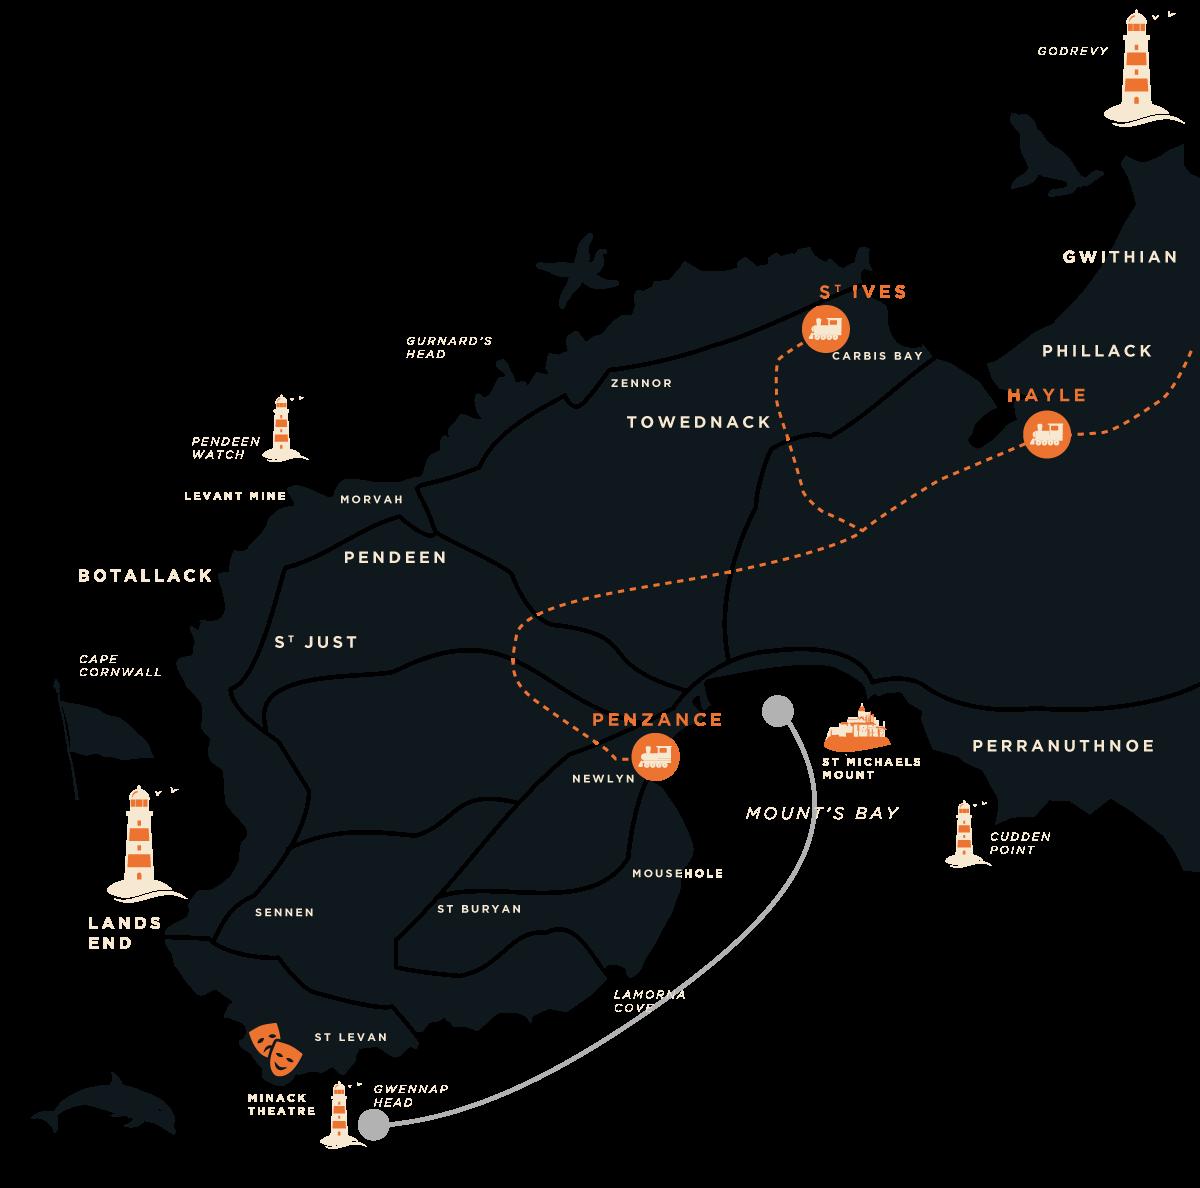 Mounts Bay Coast Boat Trip map